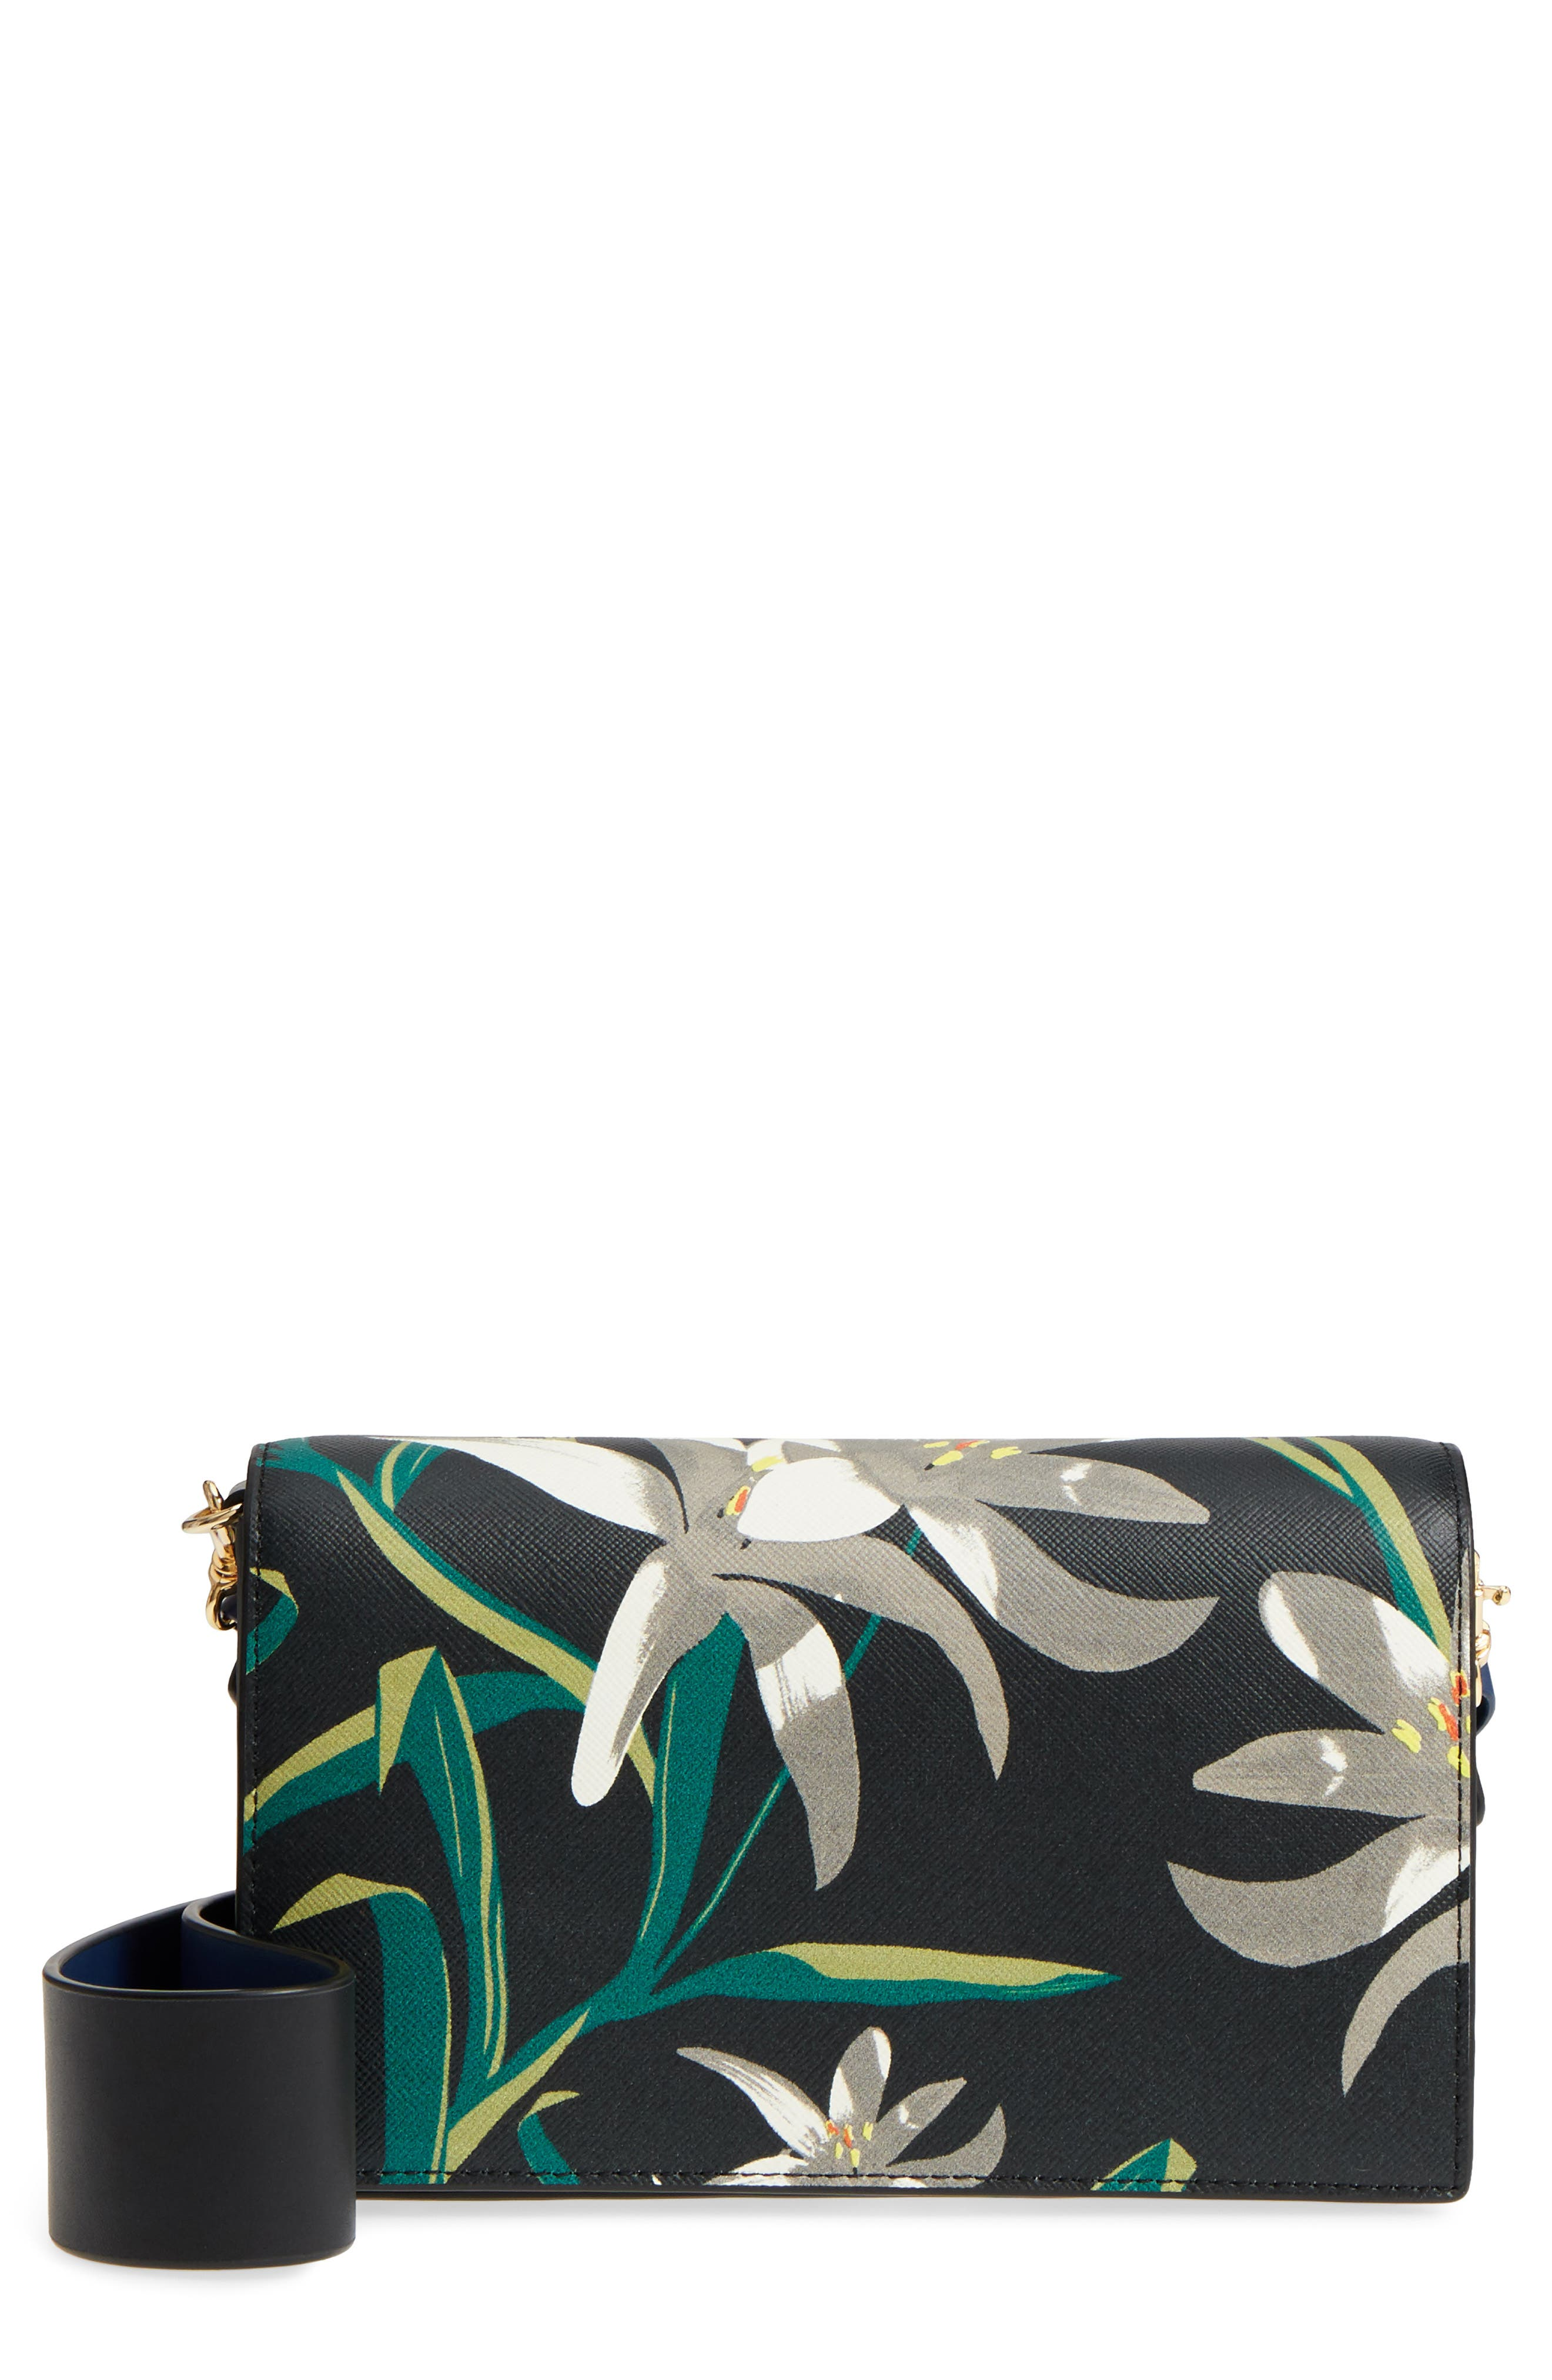 Soirée Leather Convertible Crossbody Bag,                         Main,                         color,